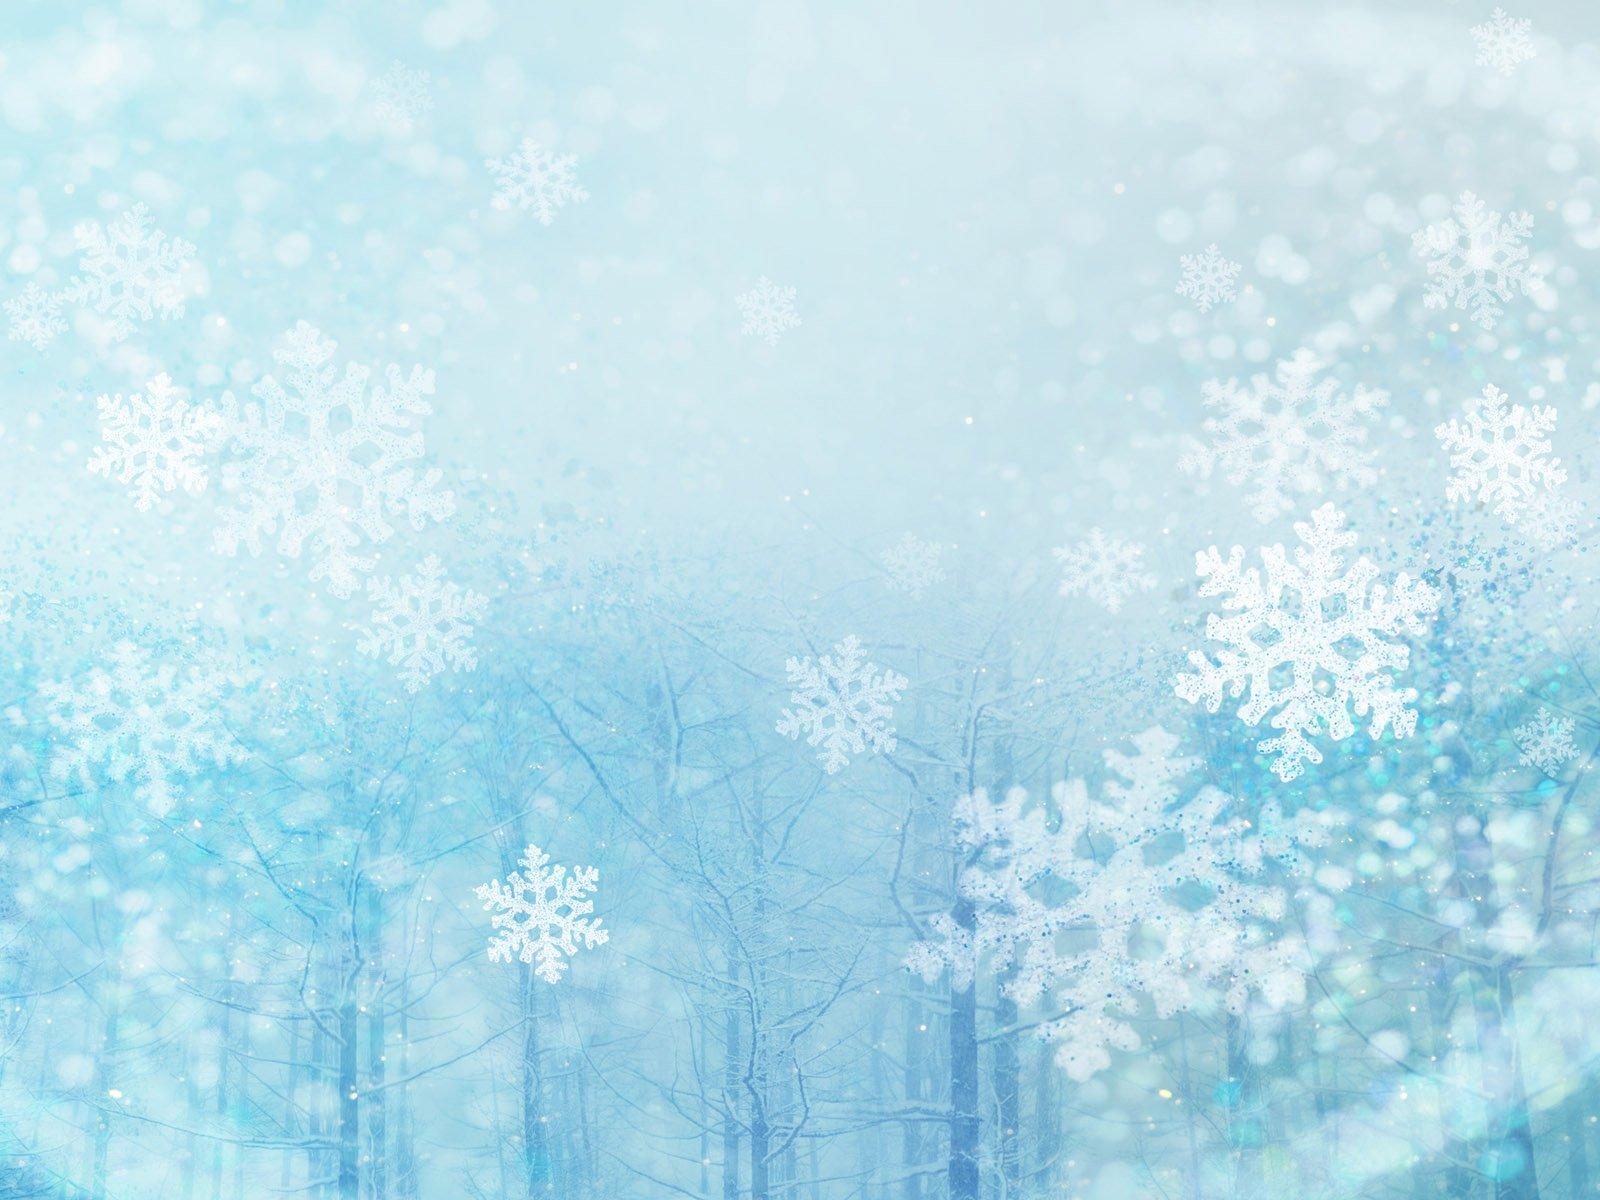 Фоны для презентаций зима снег снежинки